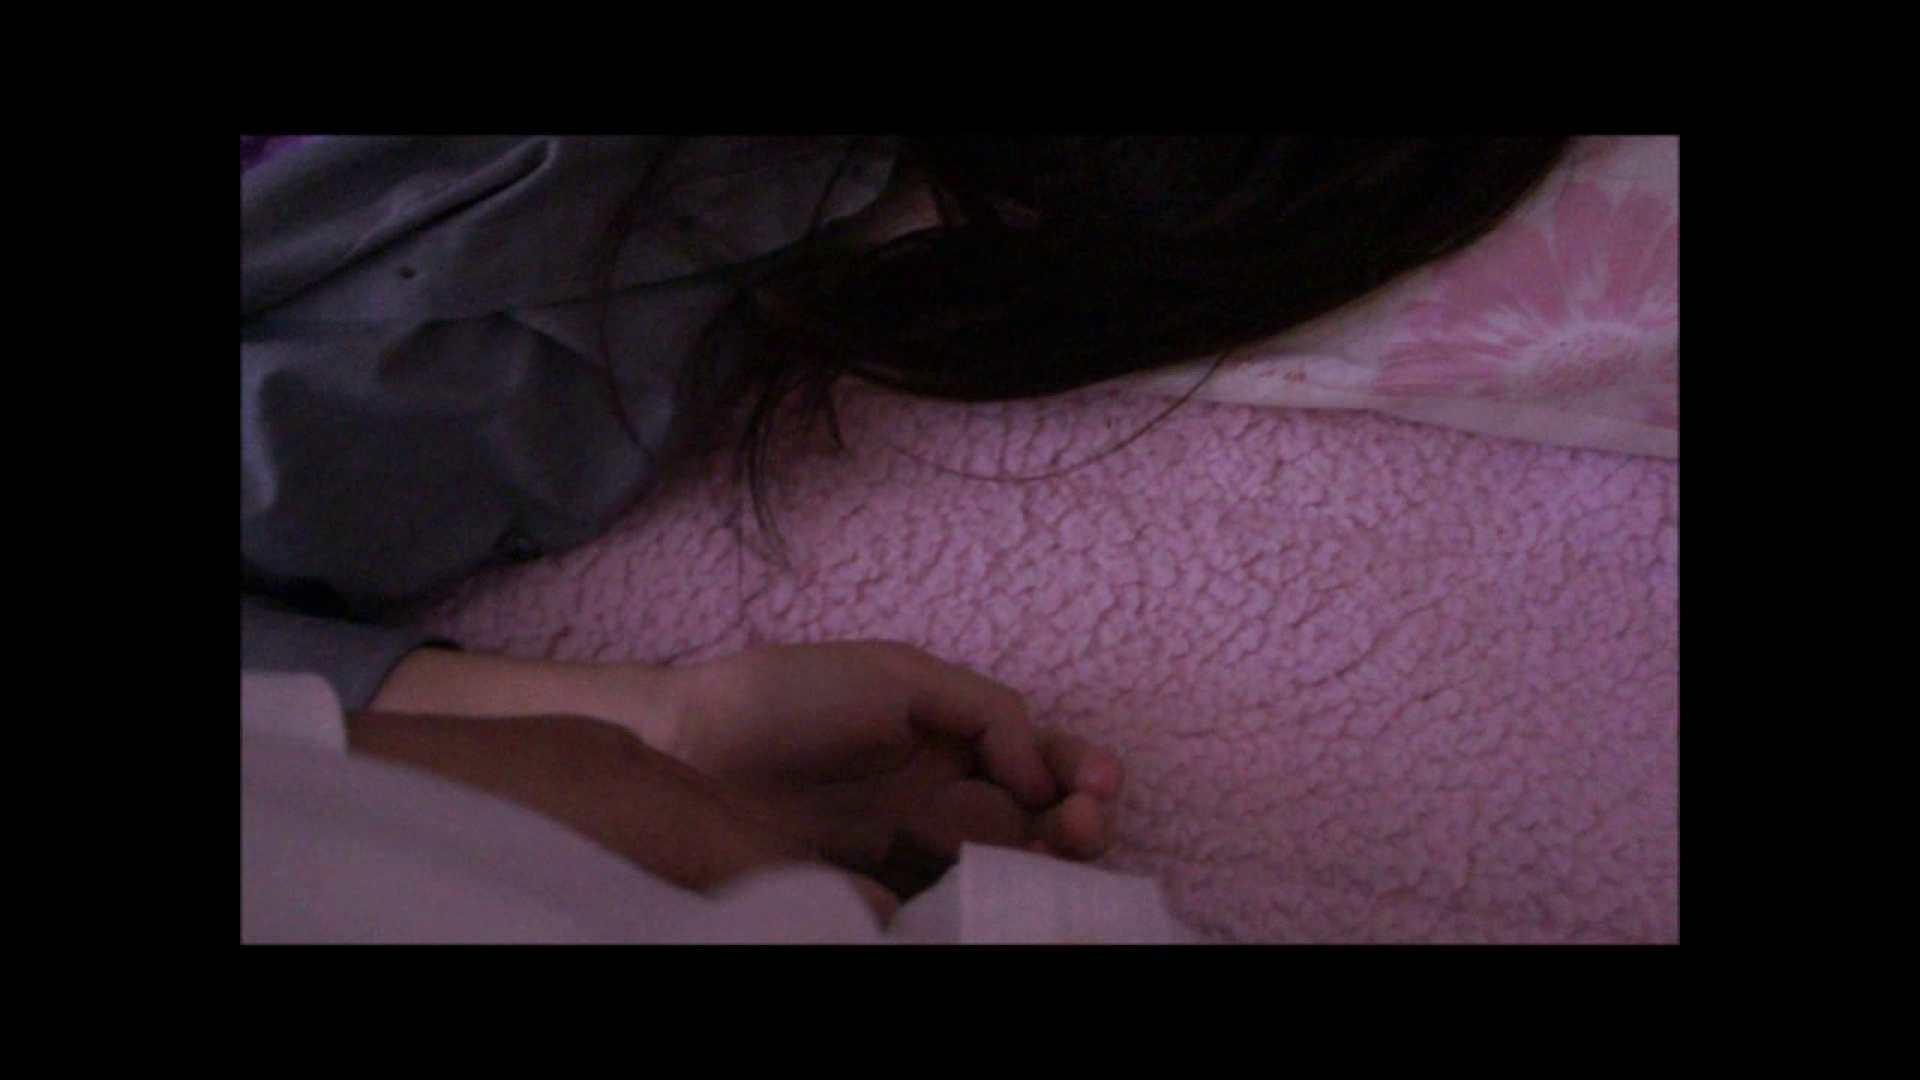 vol.15 友人が抱く葵への感情・・・弄ばれた巨乳。 悪戯 ワレメ動画紹介 85画像 71